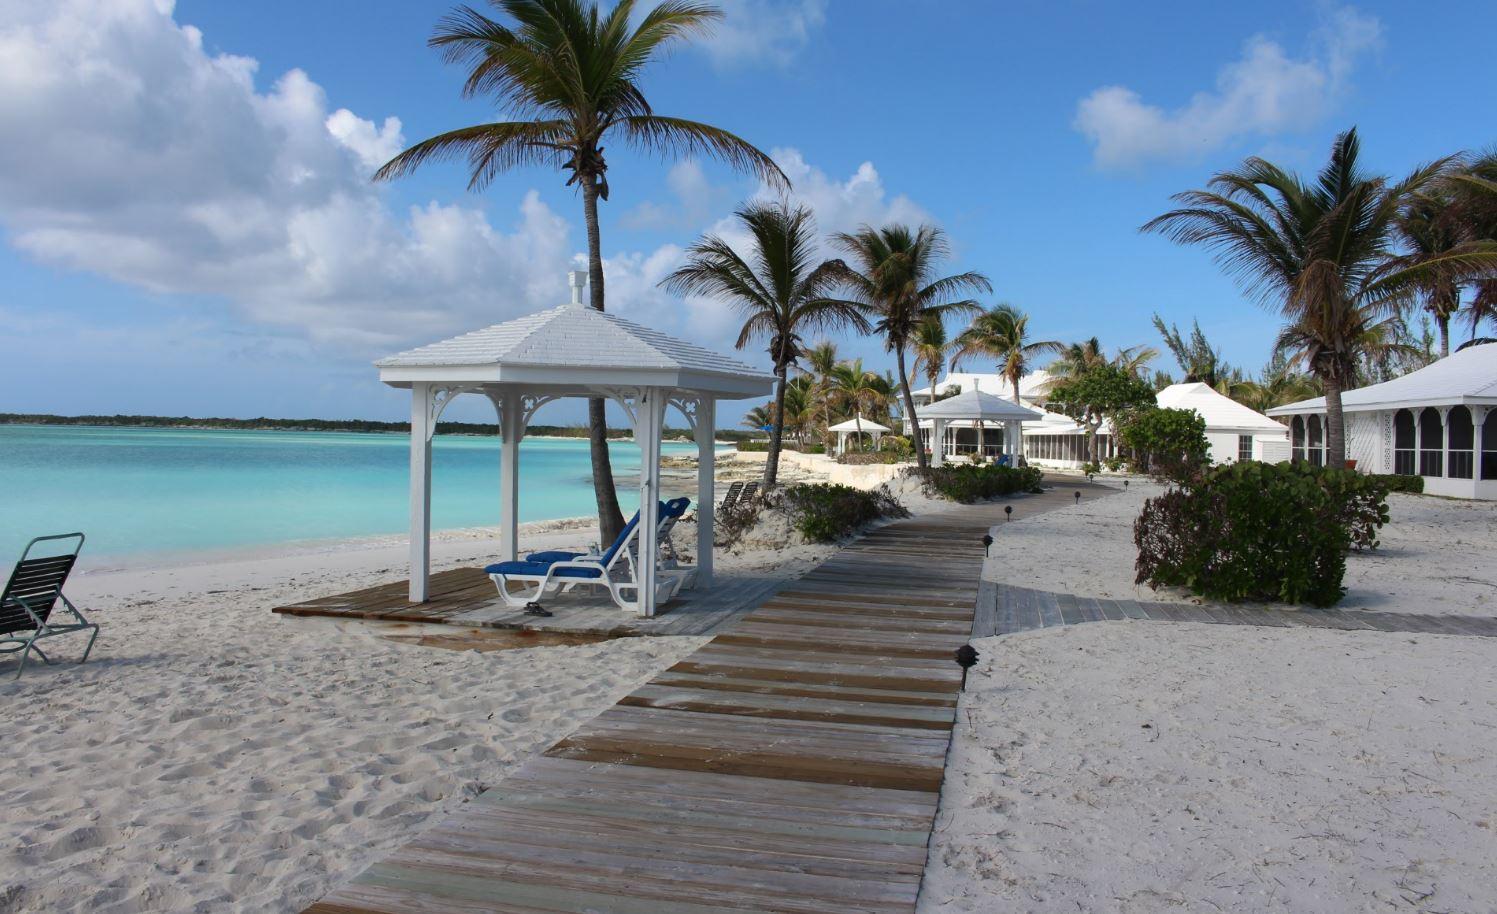 Cape Sante Maria Beach Resort